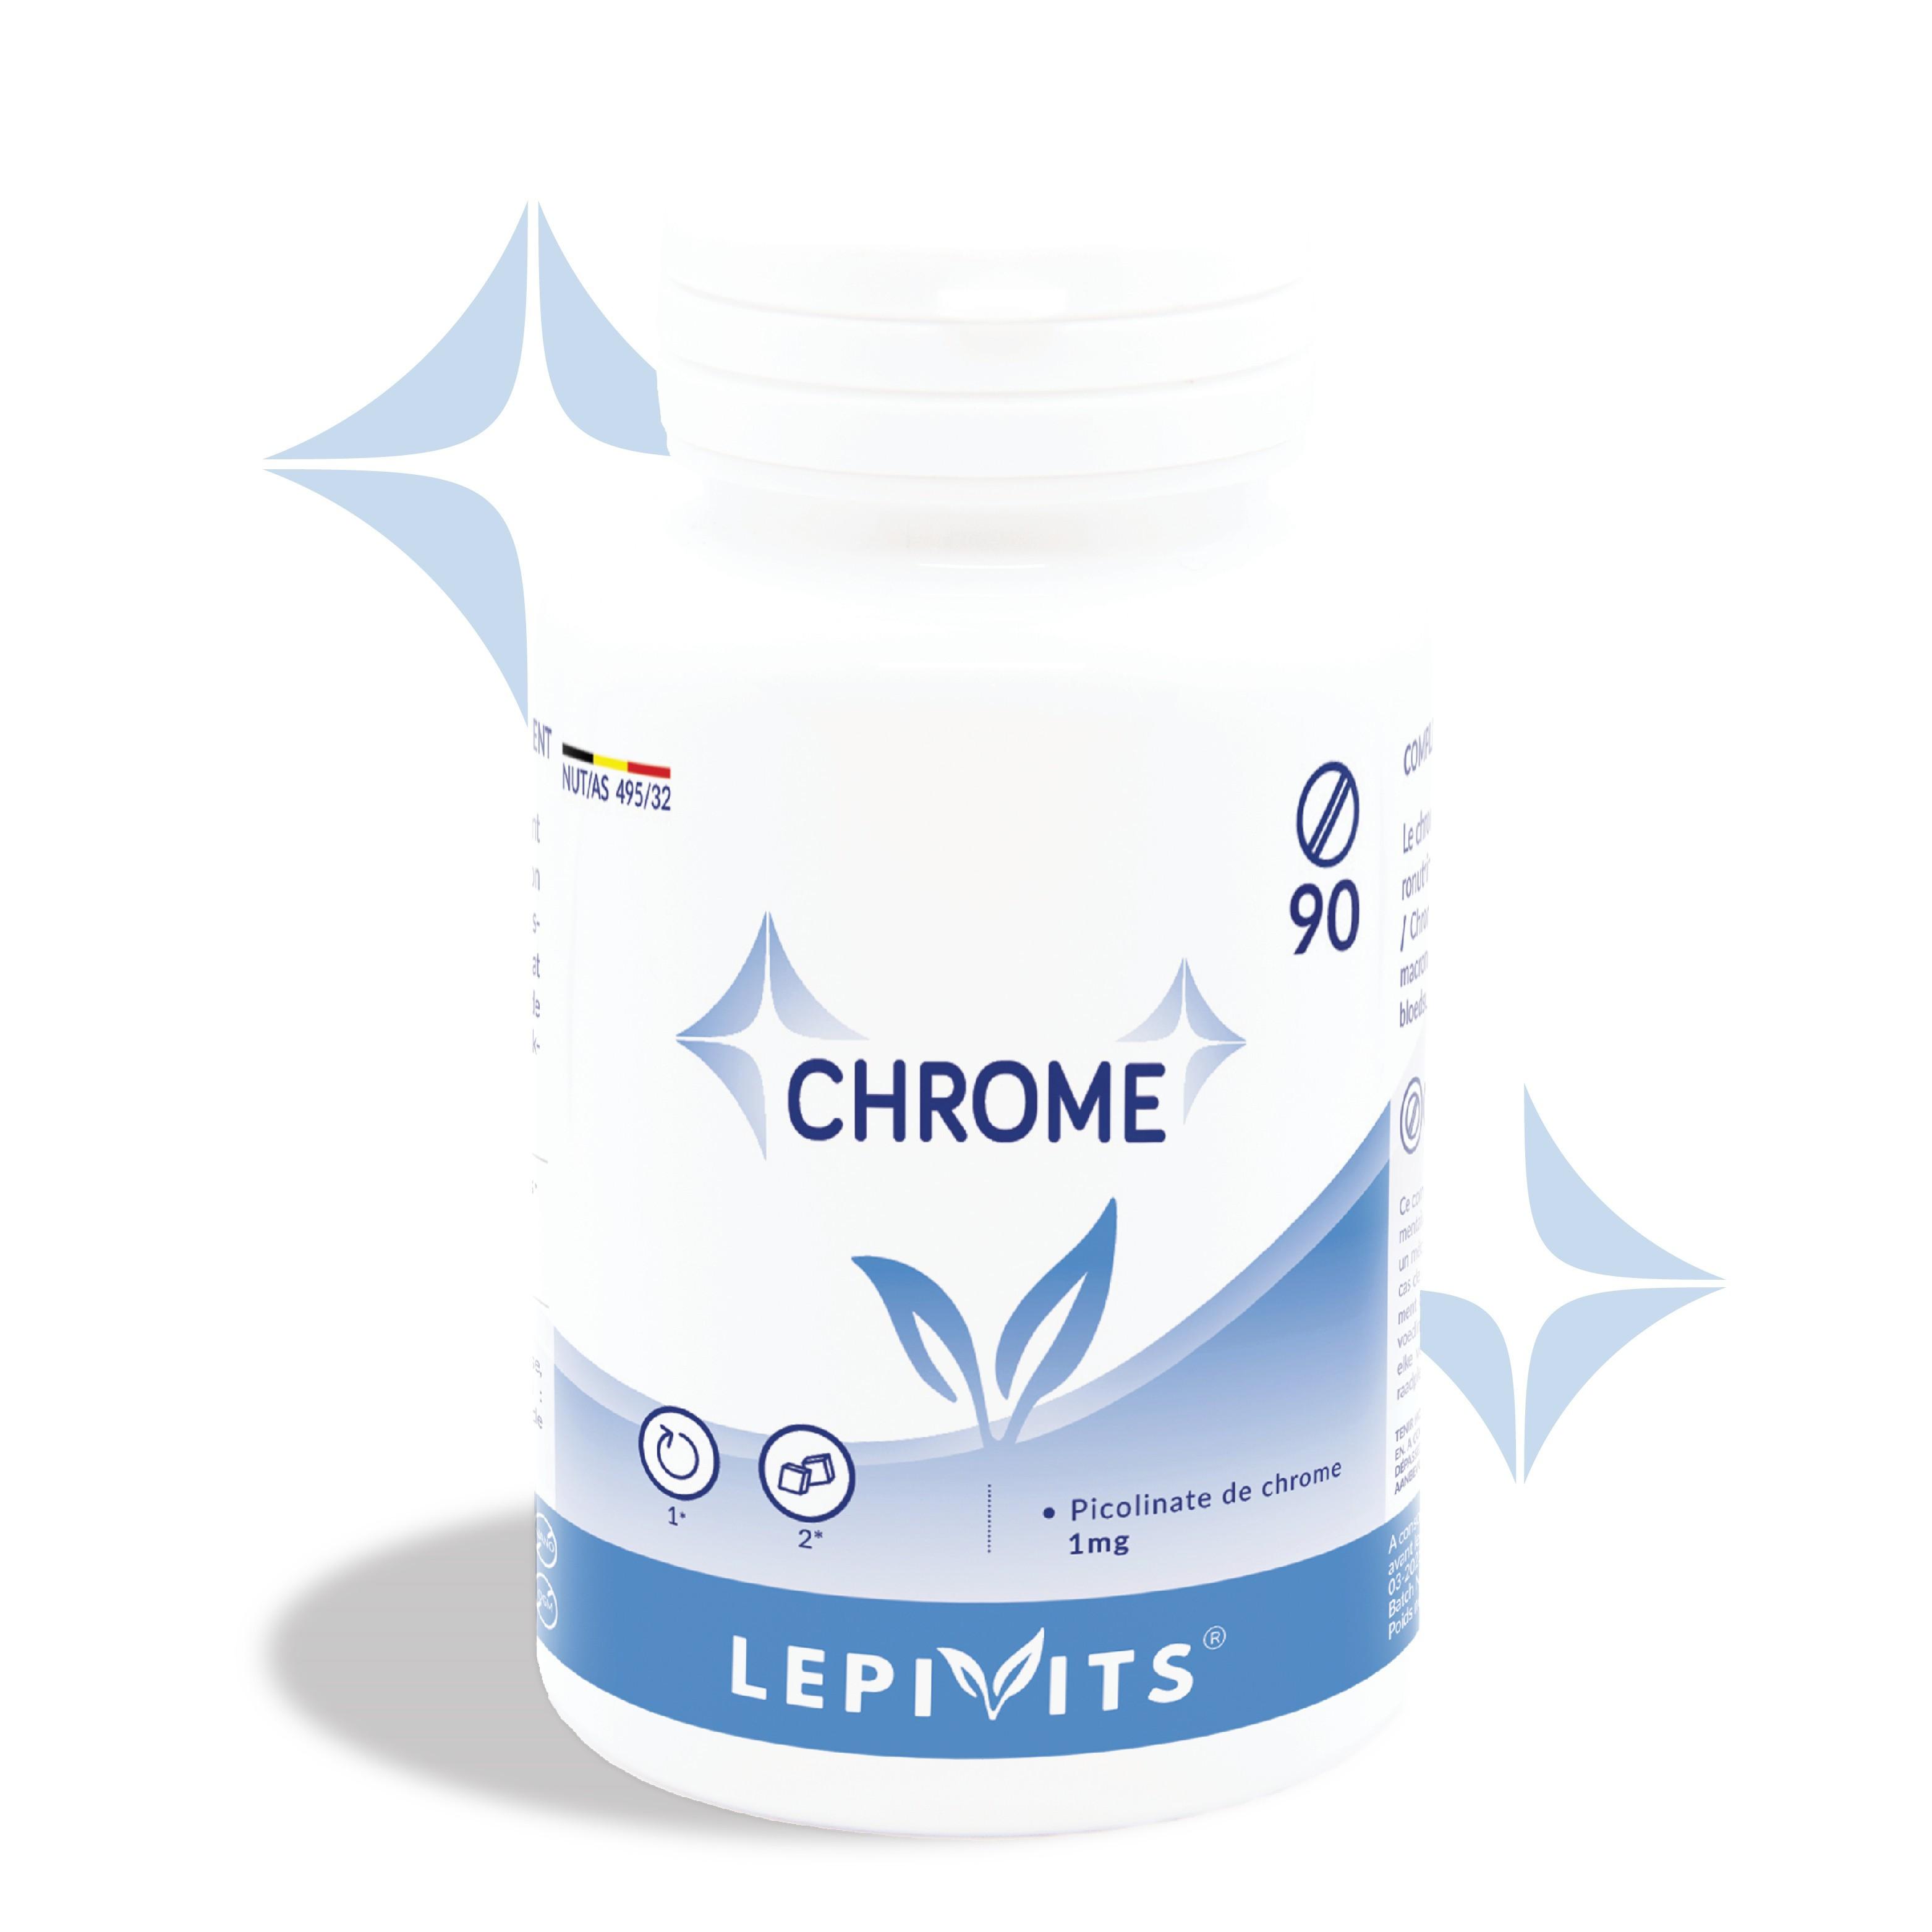 Chrome_90 tablets-LEPIVITS